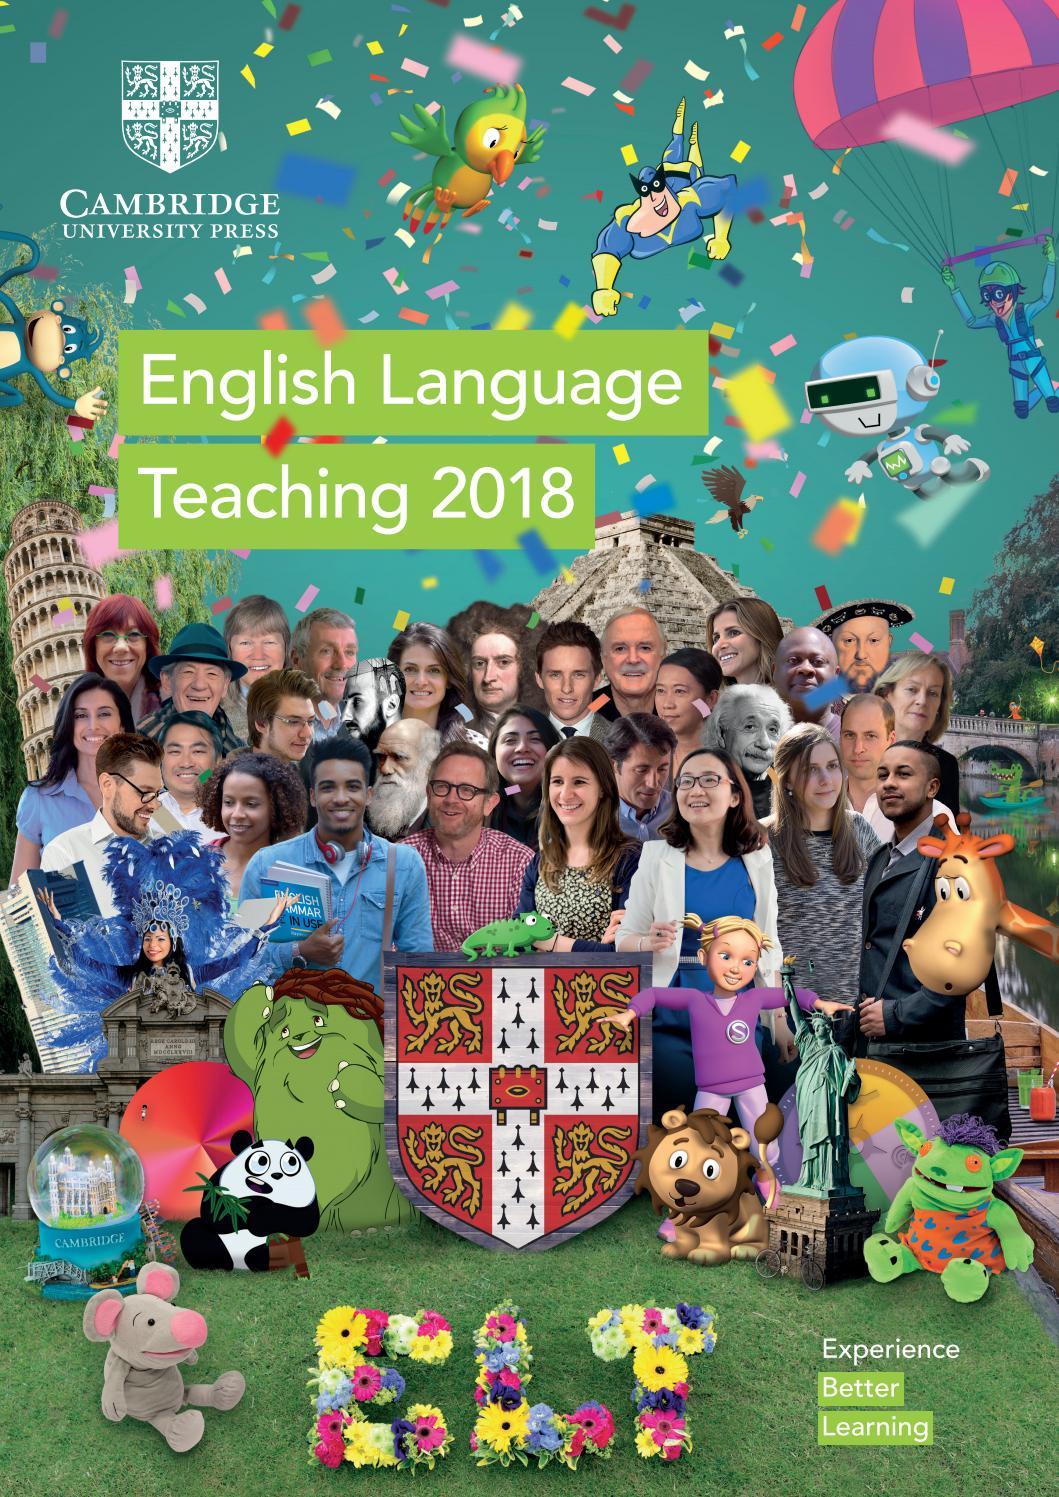 2018 elt cambridge university press catalogue korea by cambridge 2018 elt cambridge university press catalogue korea by cambridge university press issuu fandeluxe Choice Image